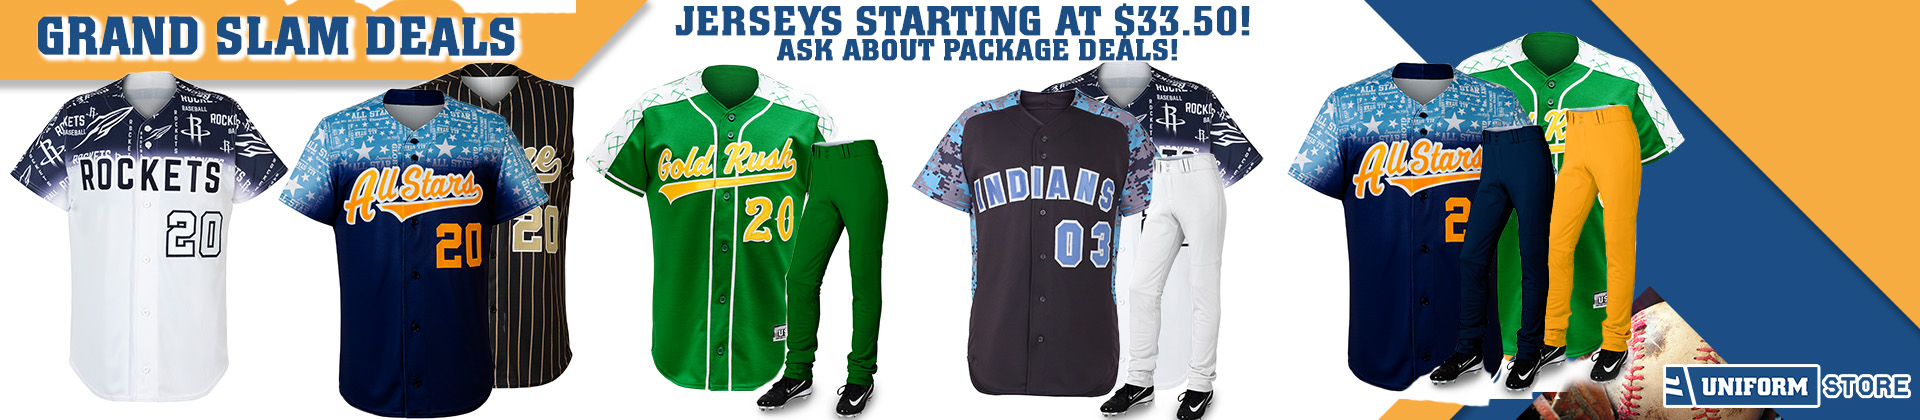 Custom Baseball Uniform Promotion